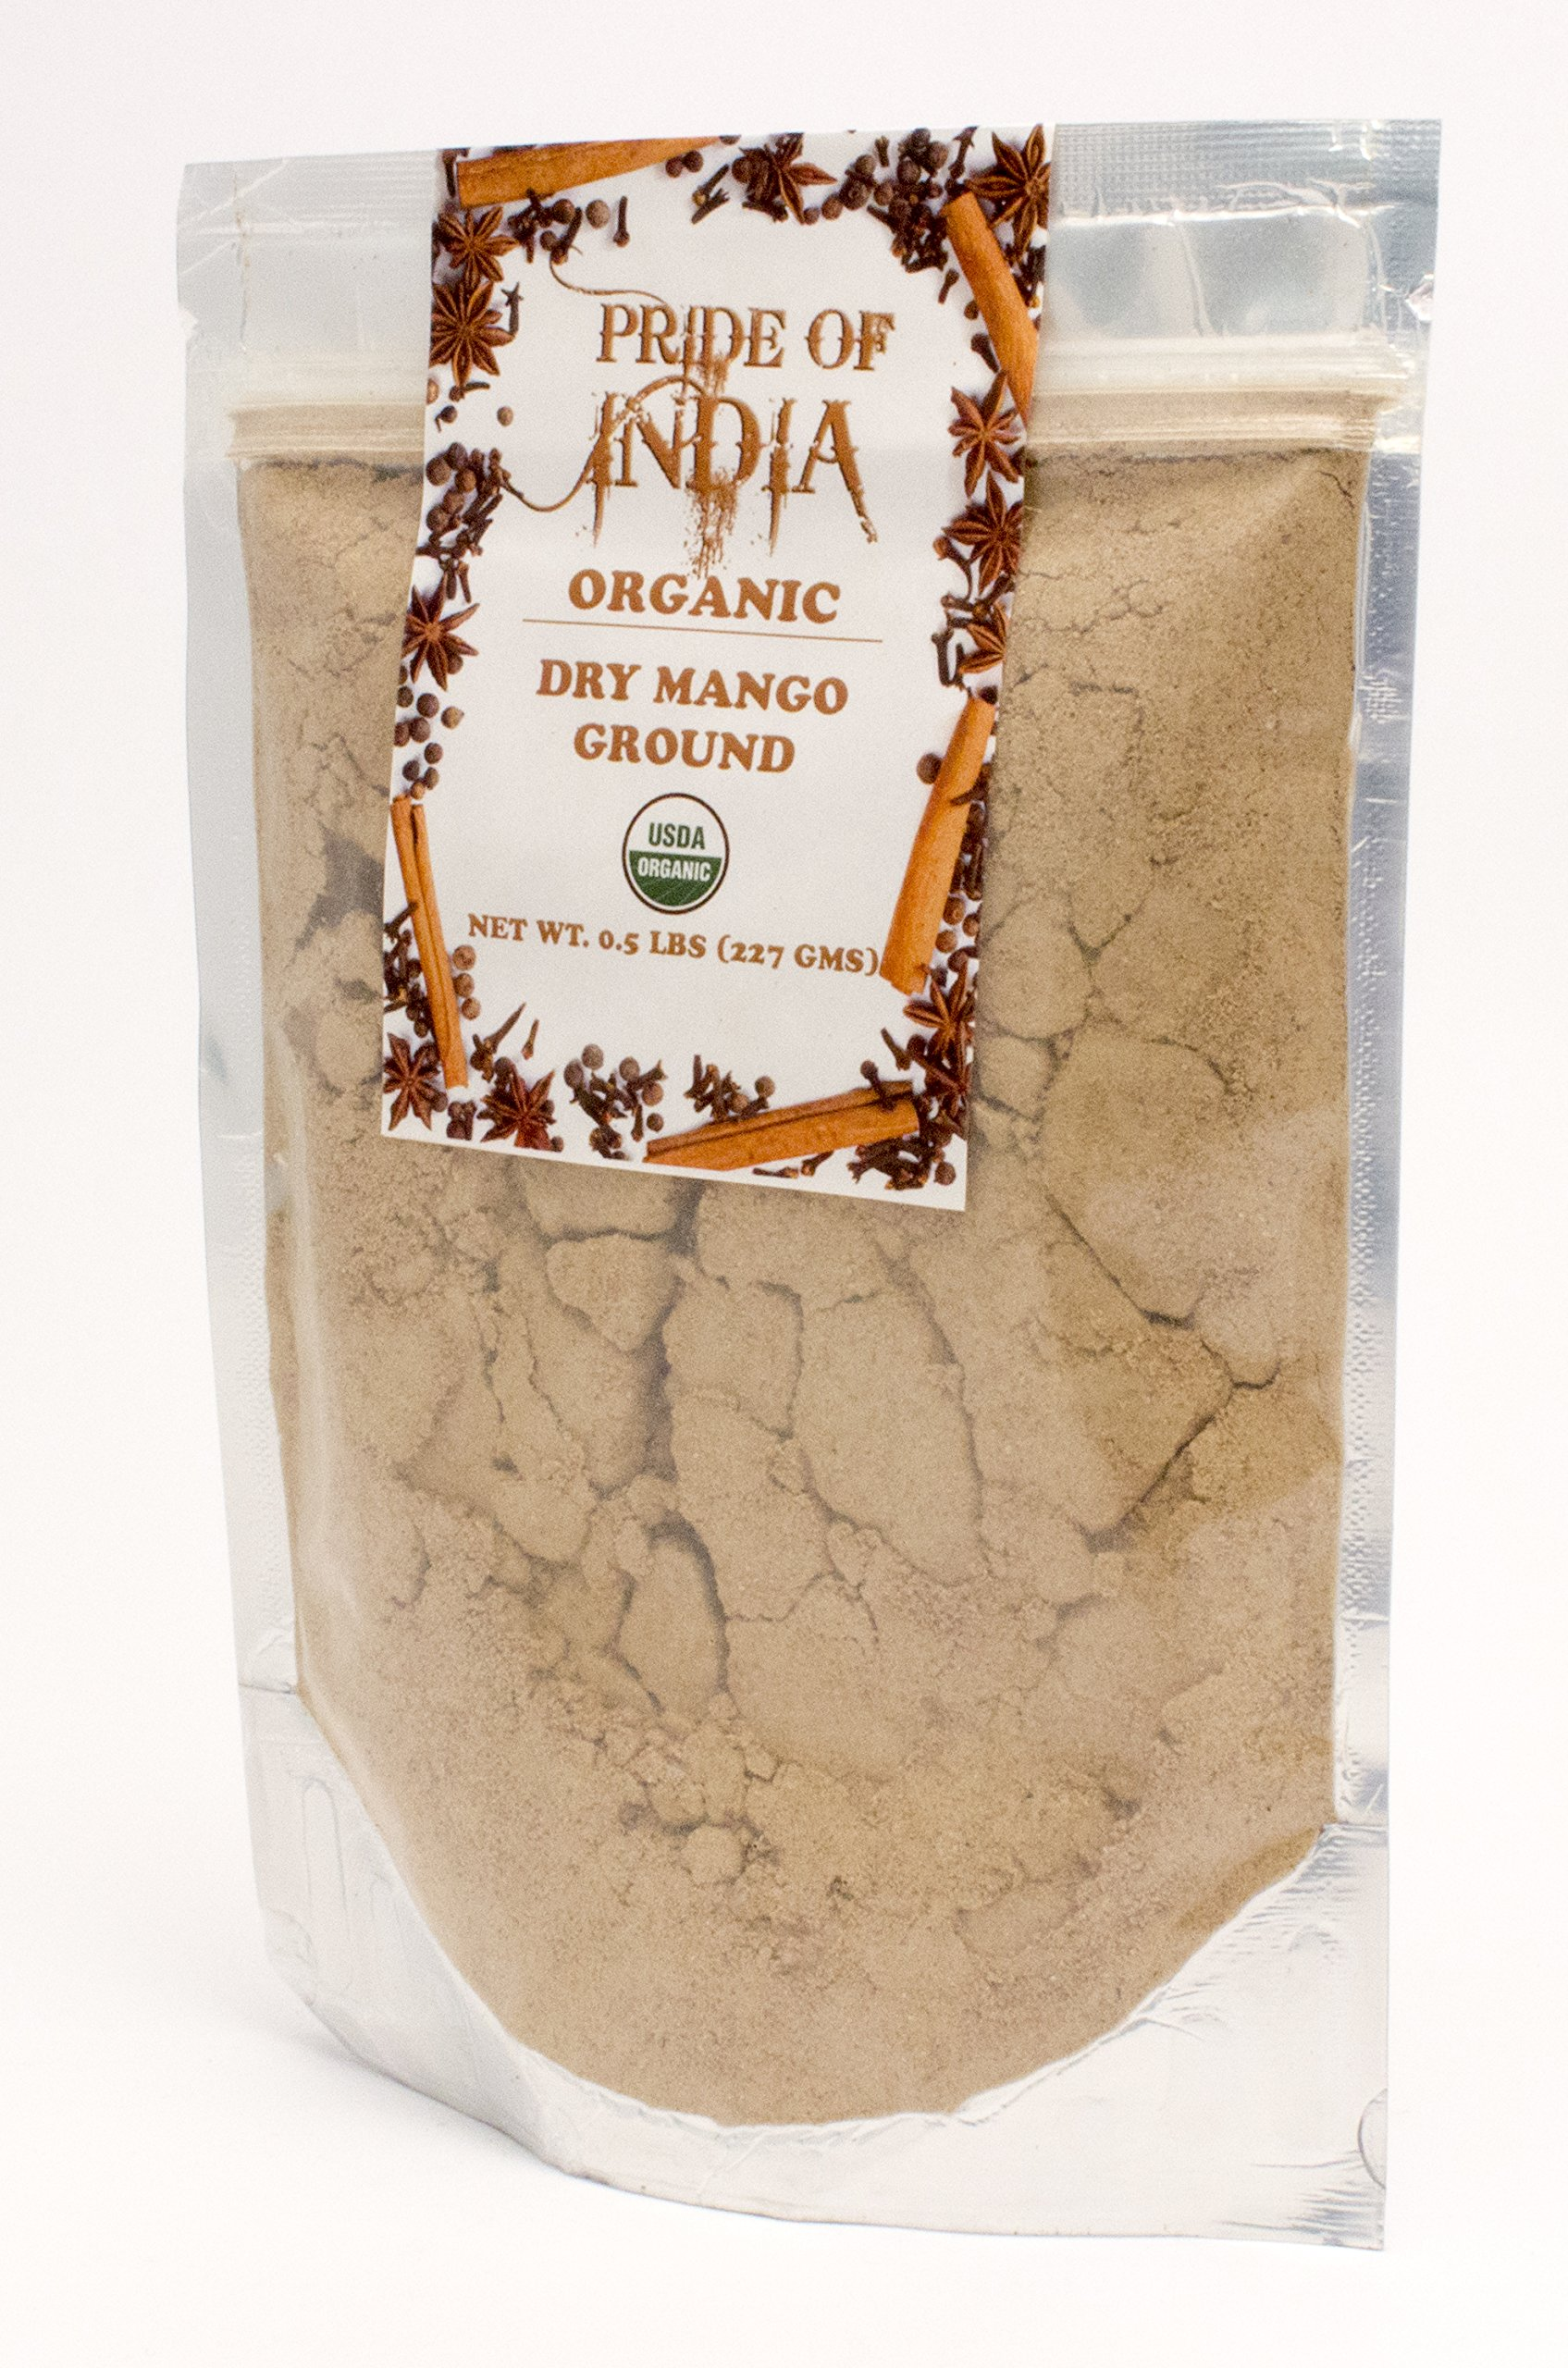 Pride Of India - Organic Dry Mango (Amchur) Powder, Half Pound